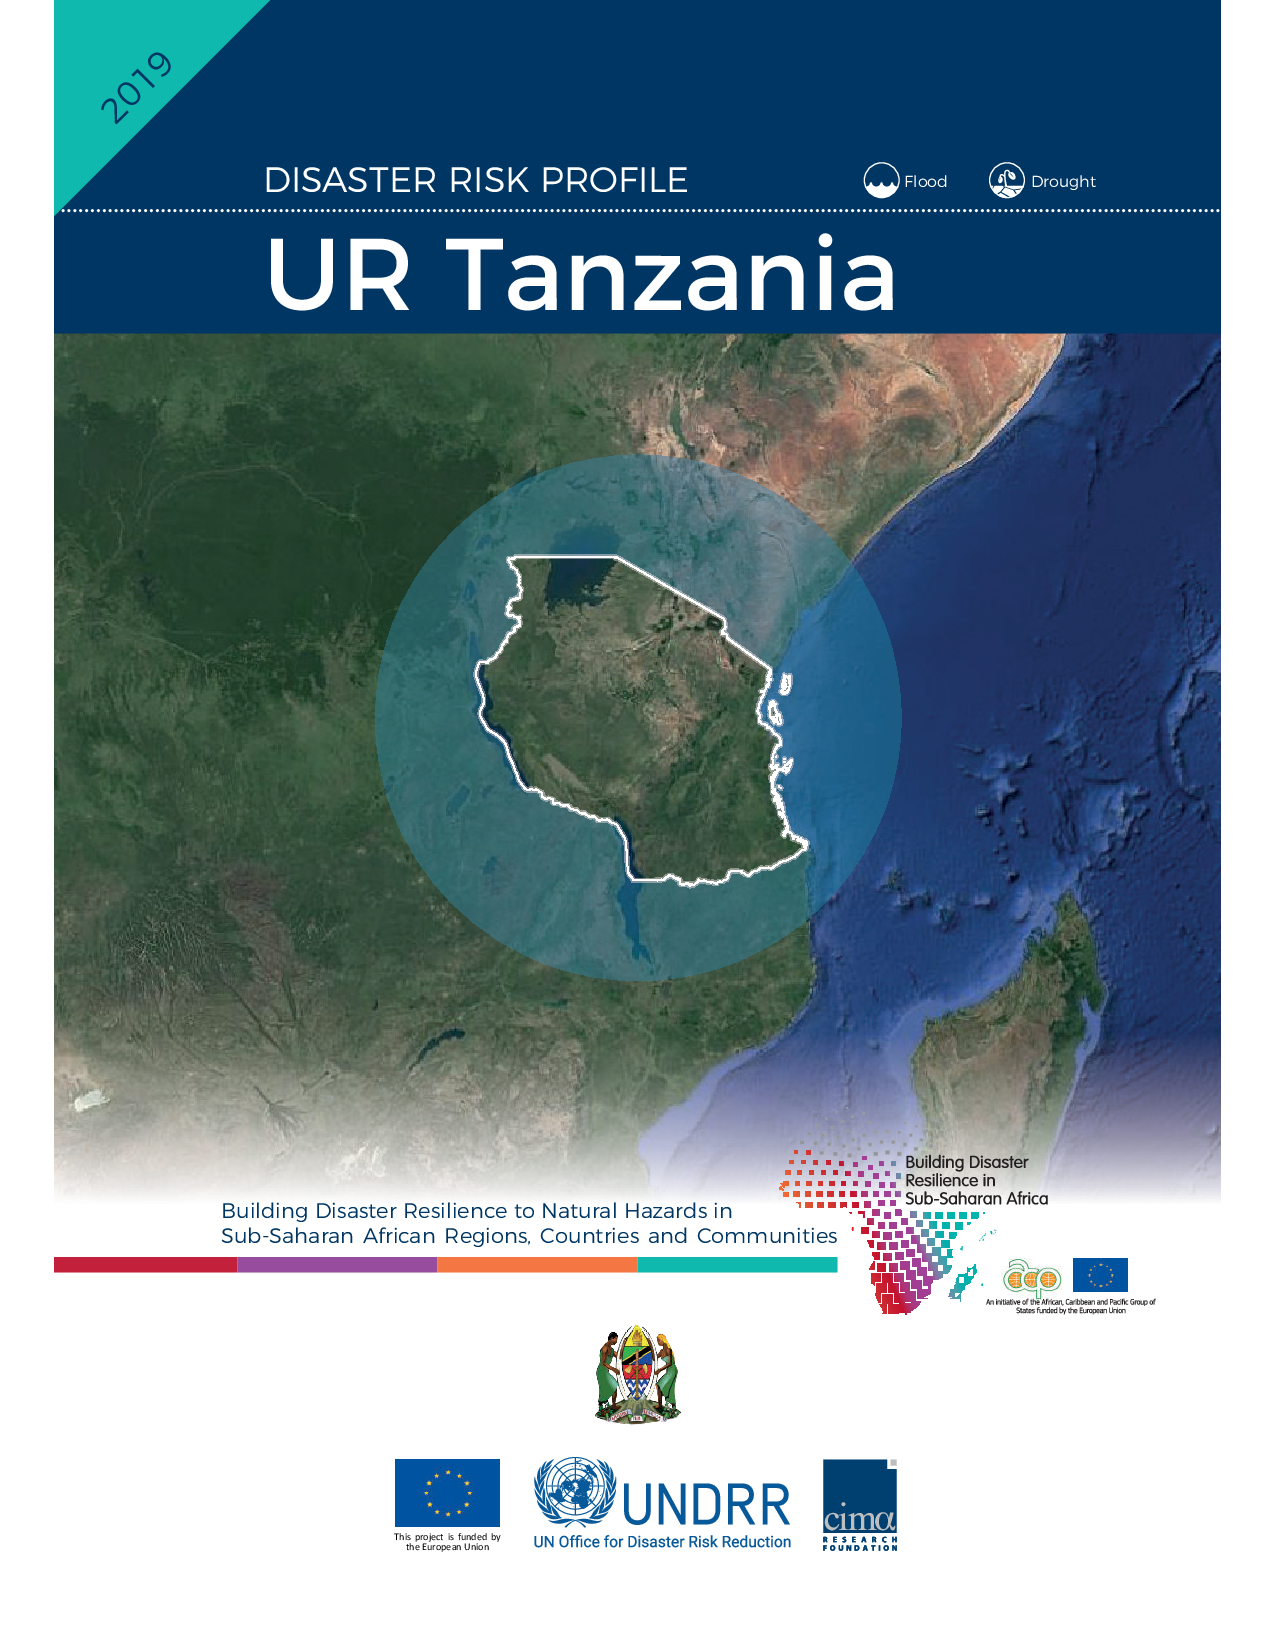 TZA: Tanzania Risk Profile - Floods & Droughts (2019)